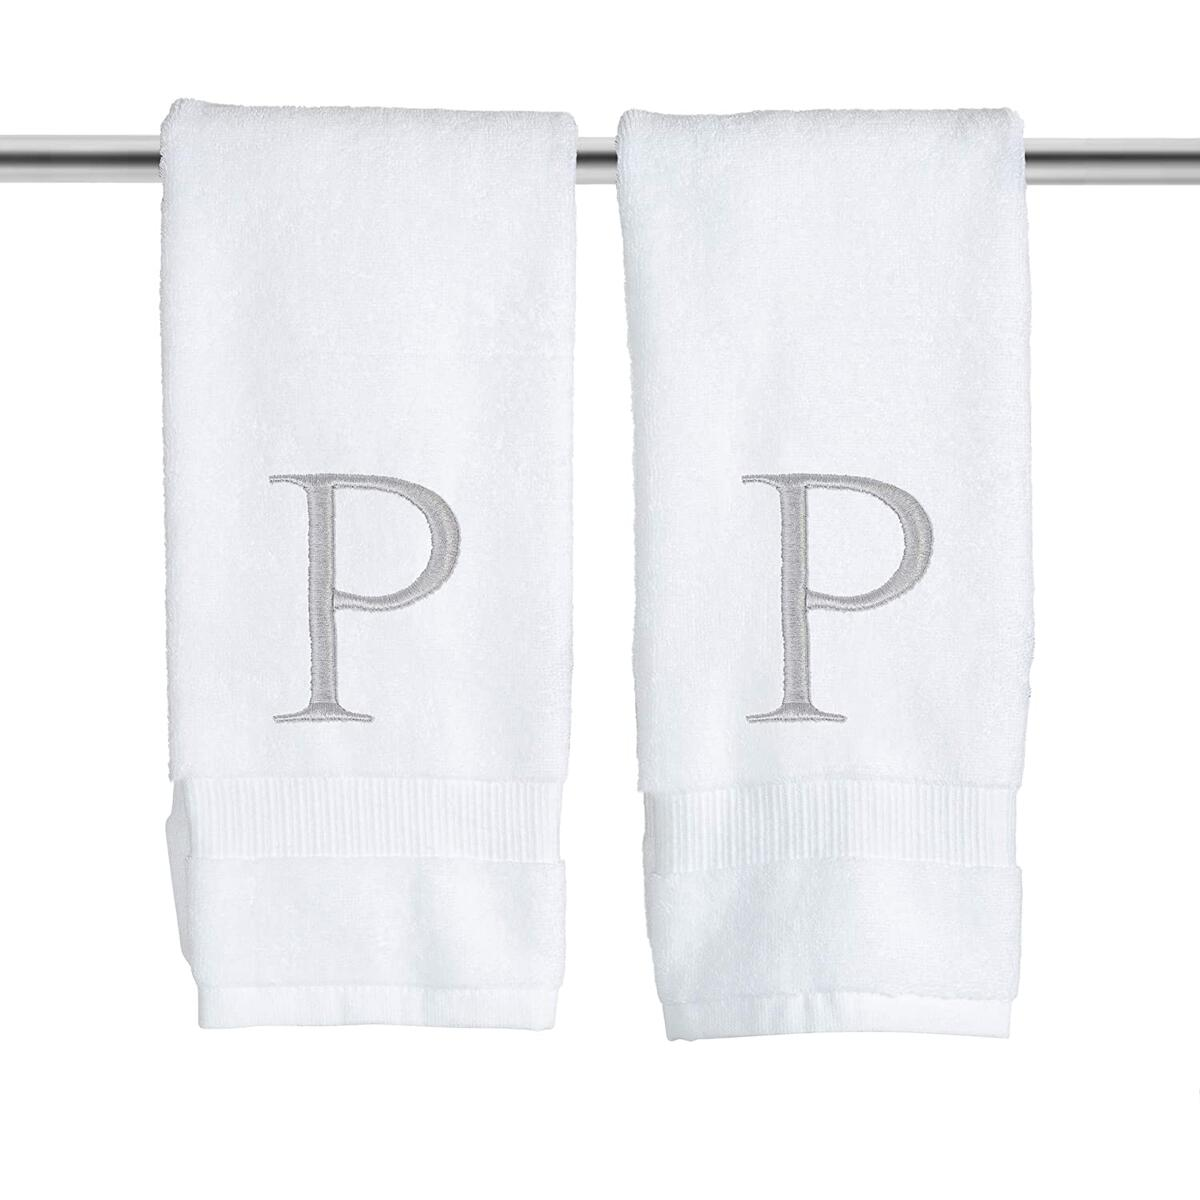 Organic Monogrammed Hand Towel for Bathroom Set of 2 - Letter P